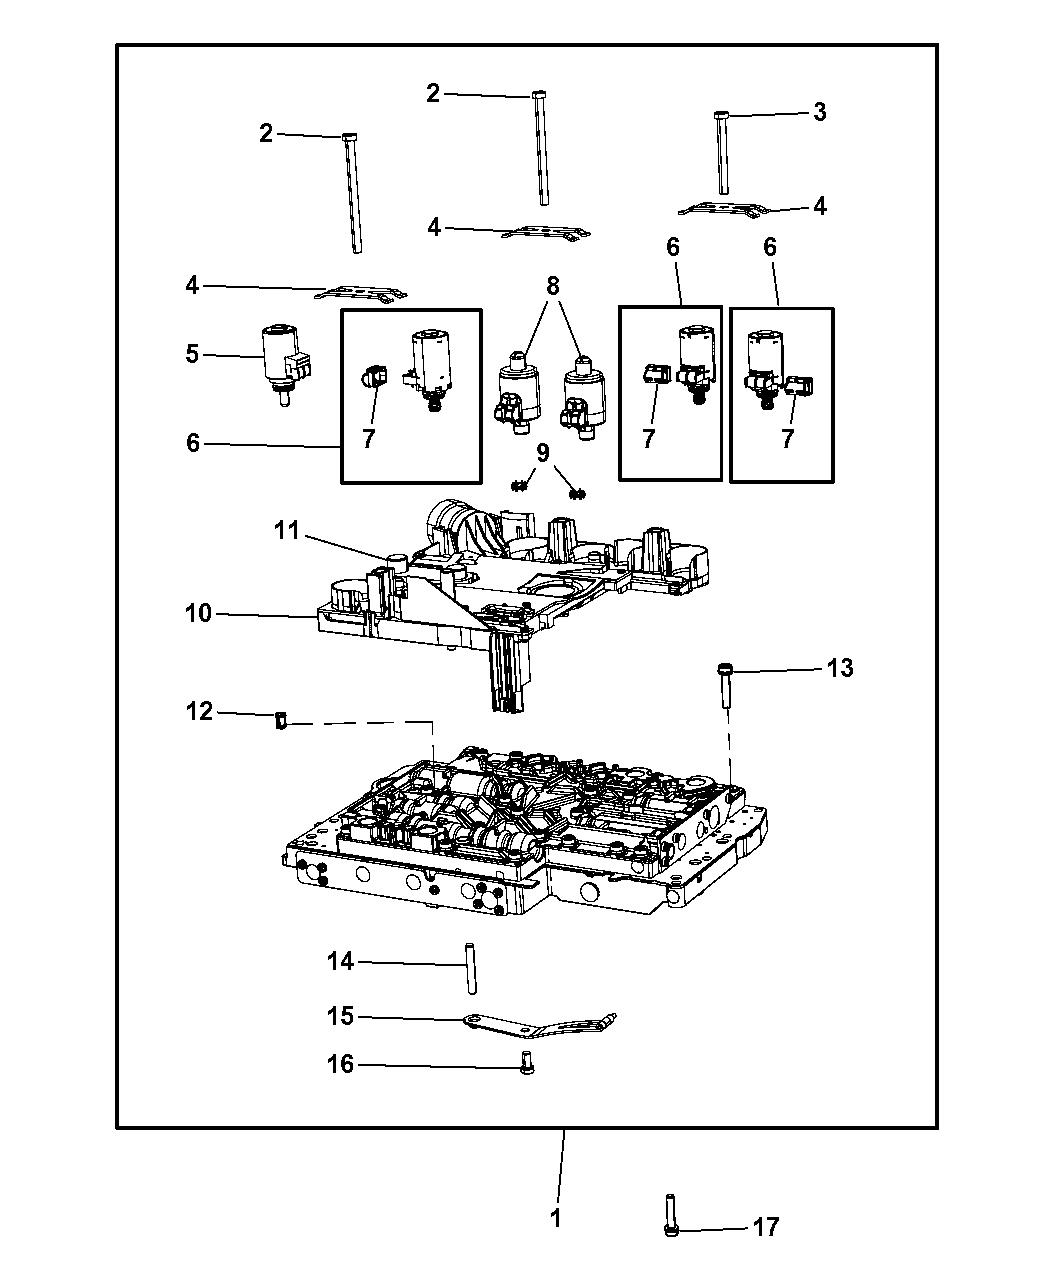 2013 jeep wrangler valve body & related parts